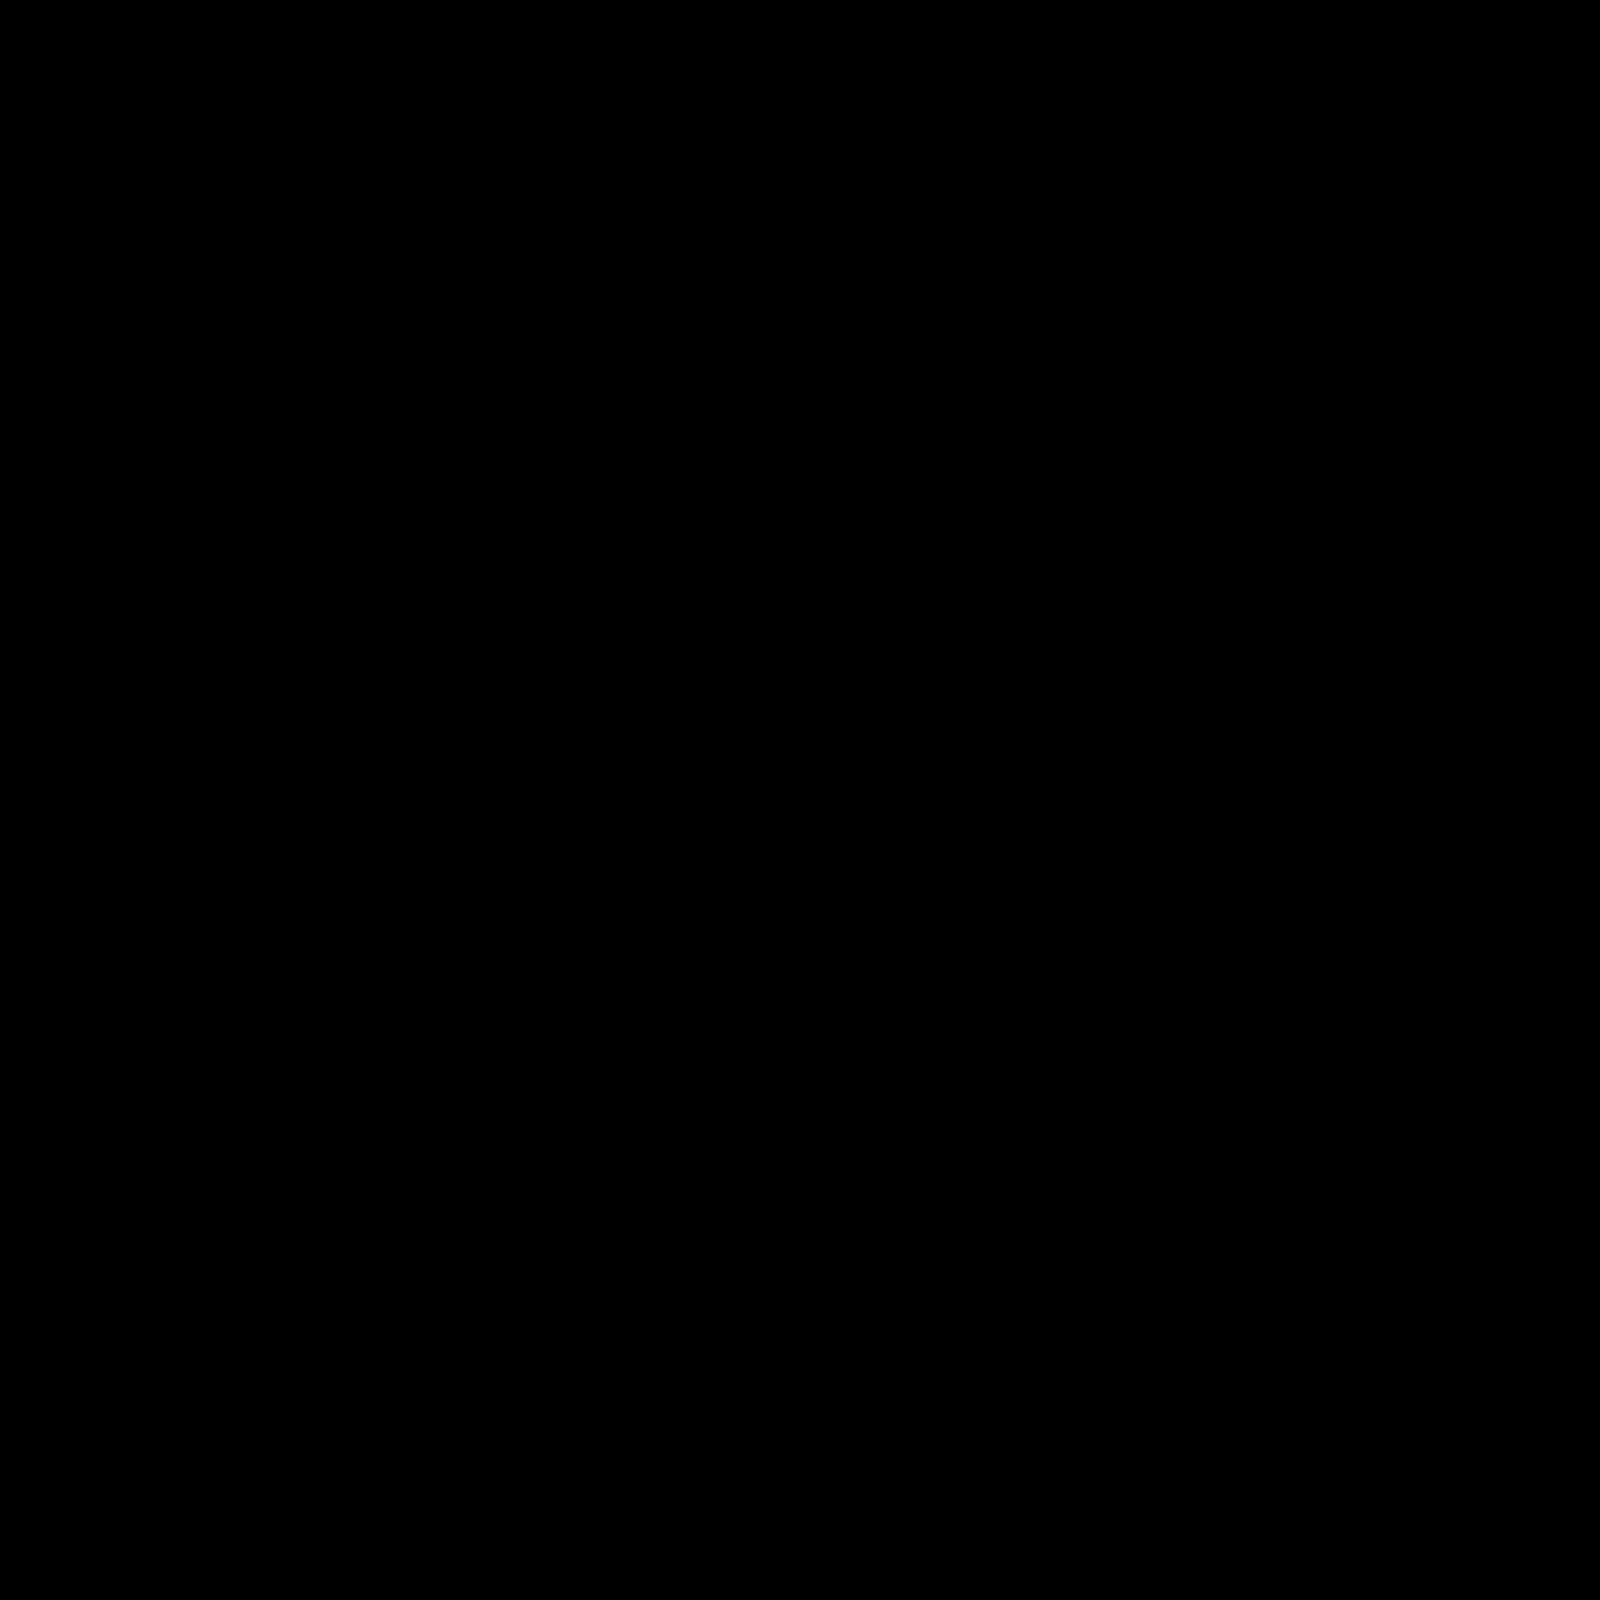 Sheet Music Filled icon